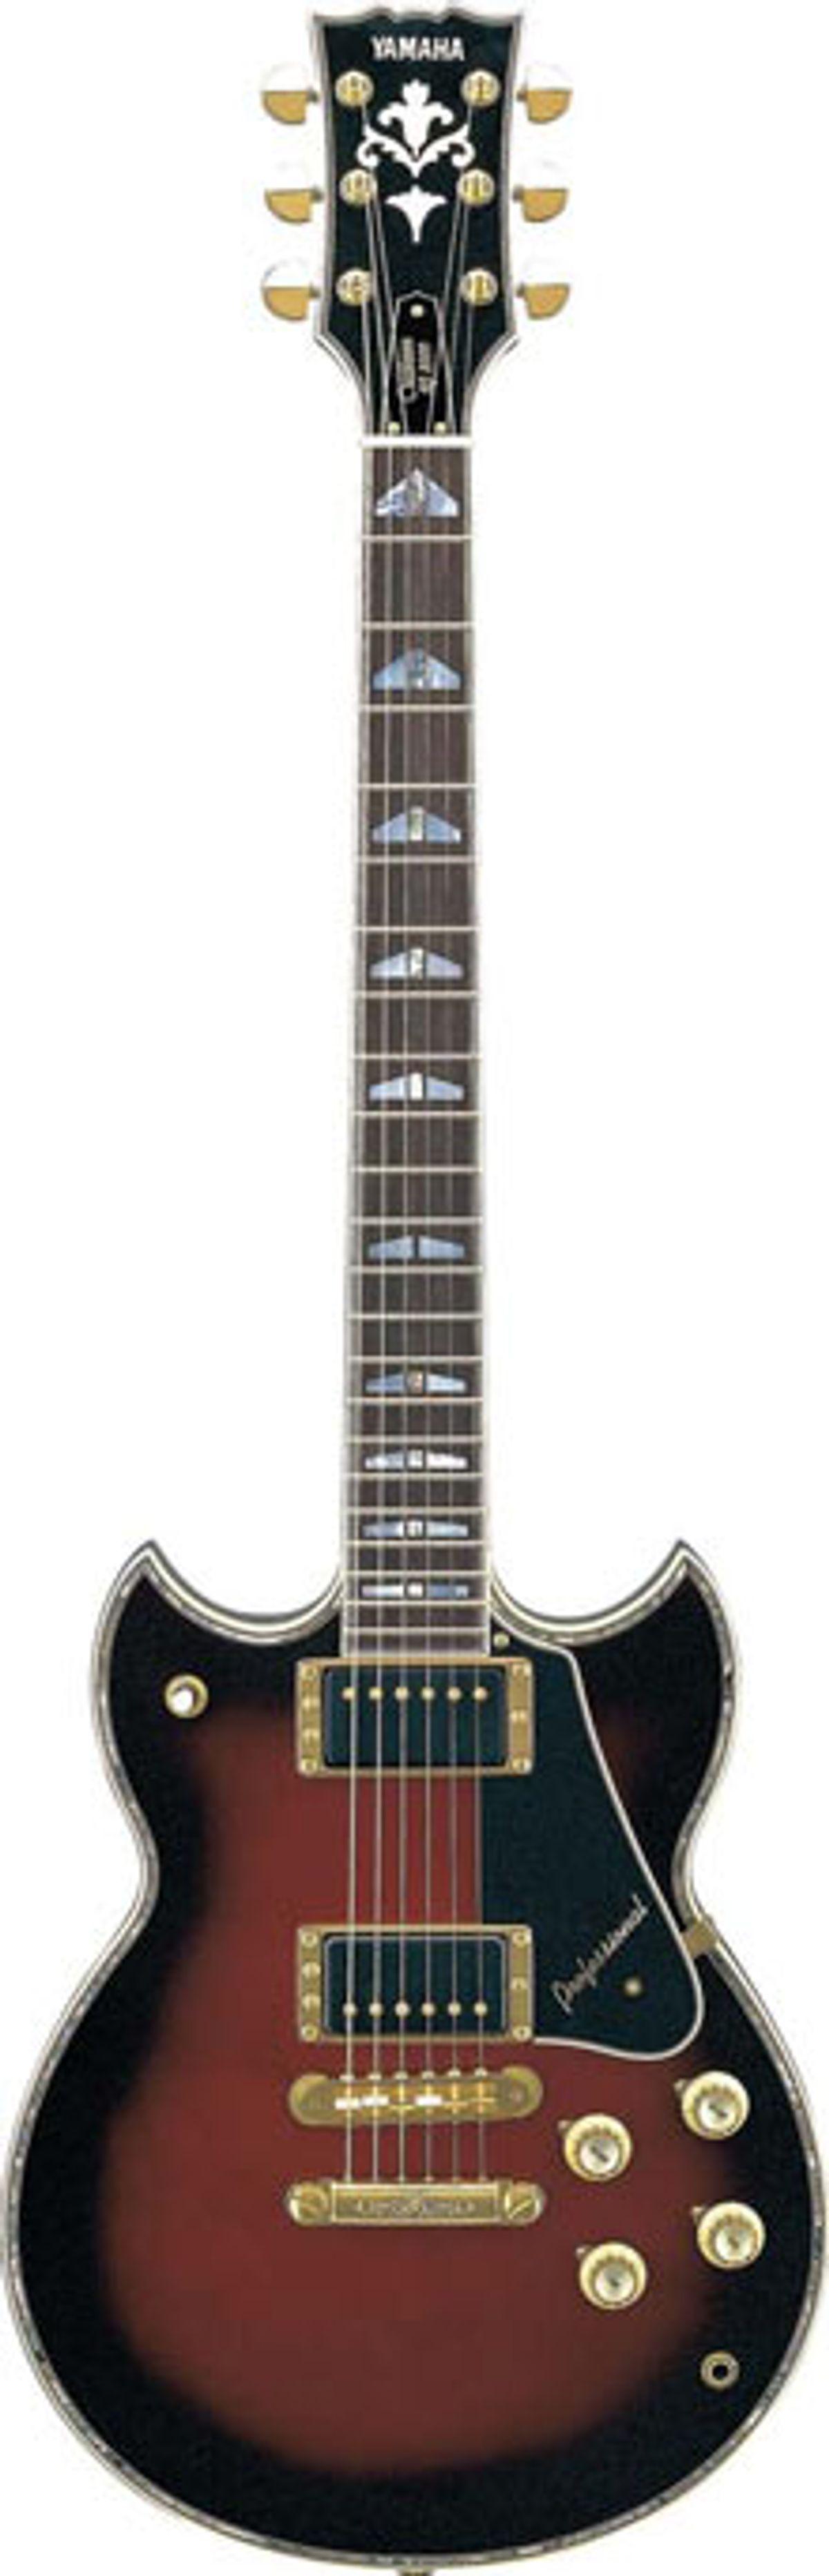 Yamaha 40th Anniversary Limited Edition SBG3000